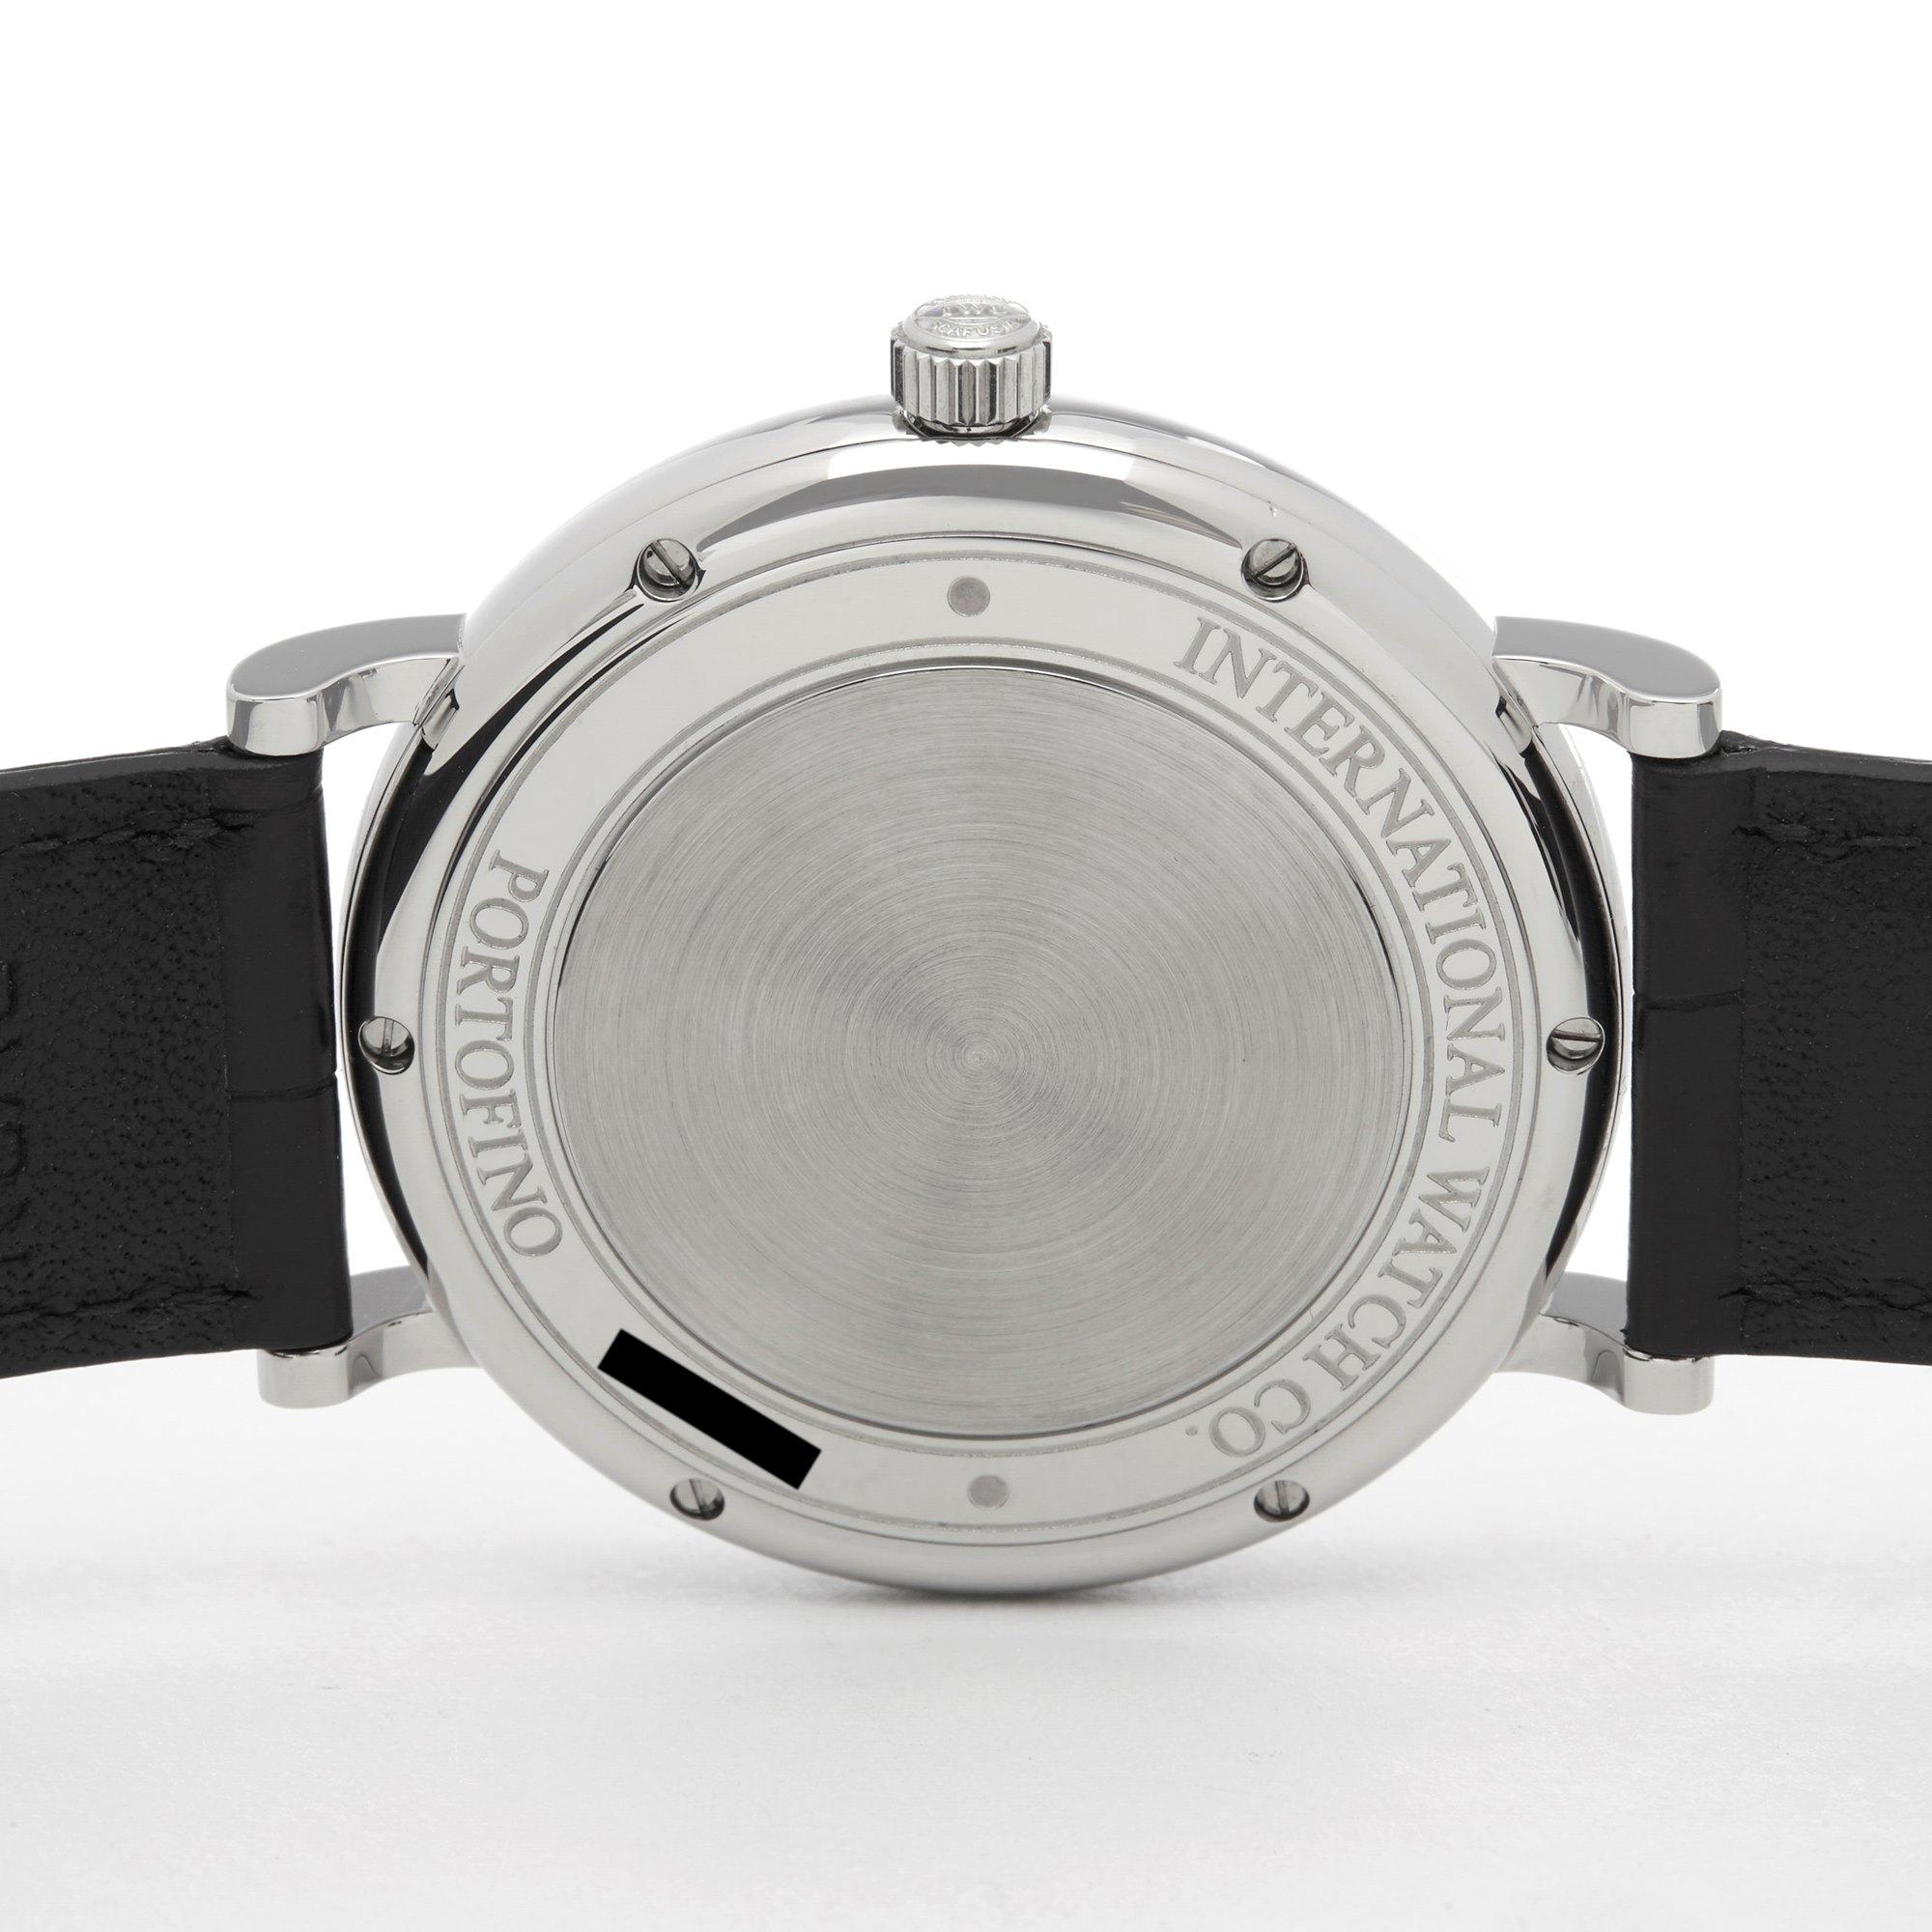 IWC Portofino Stainless Steel 356501